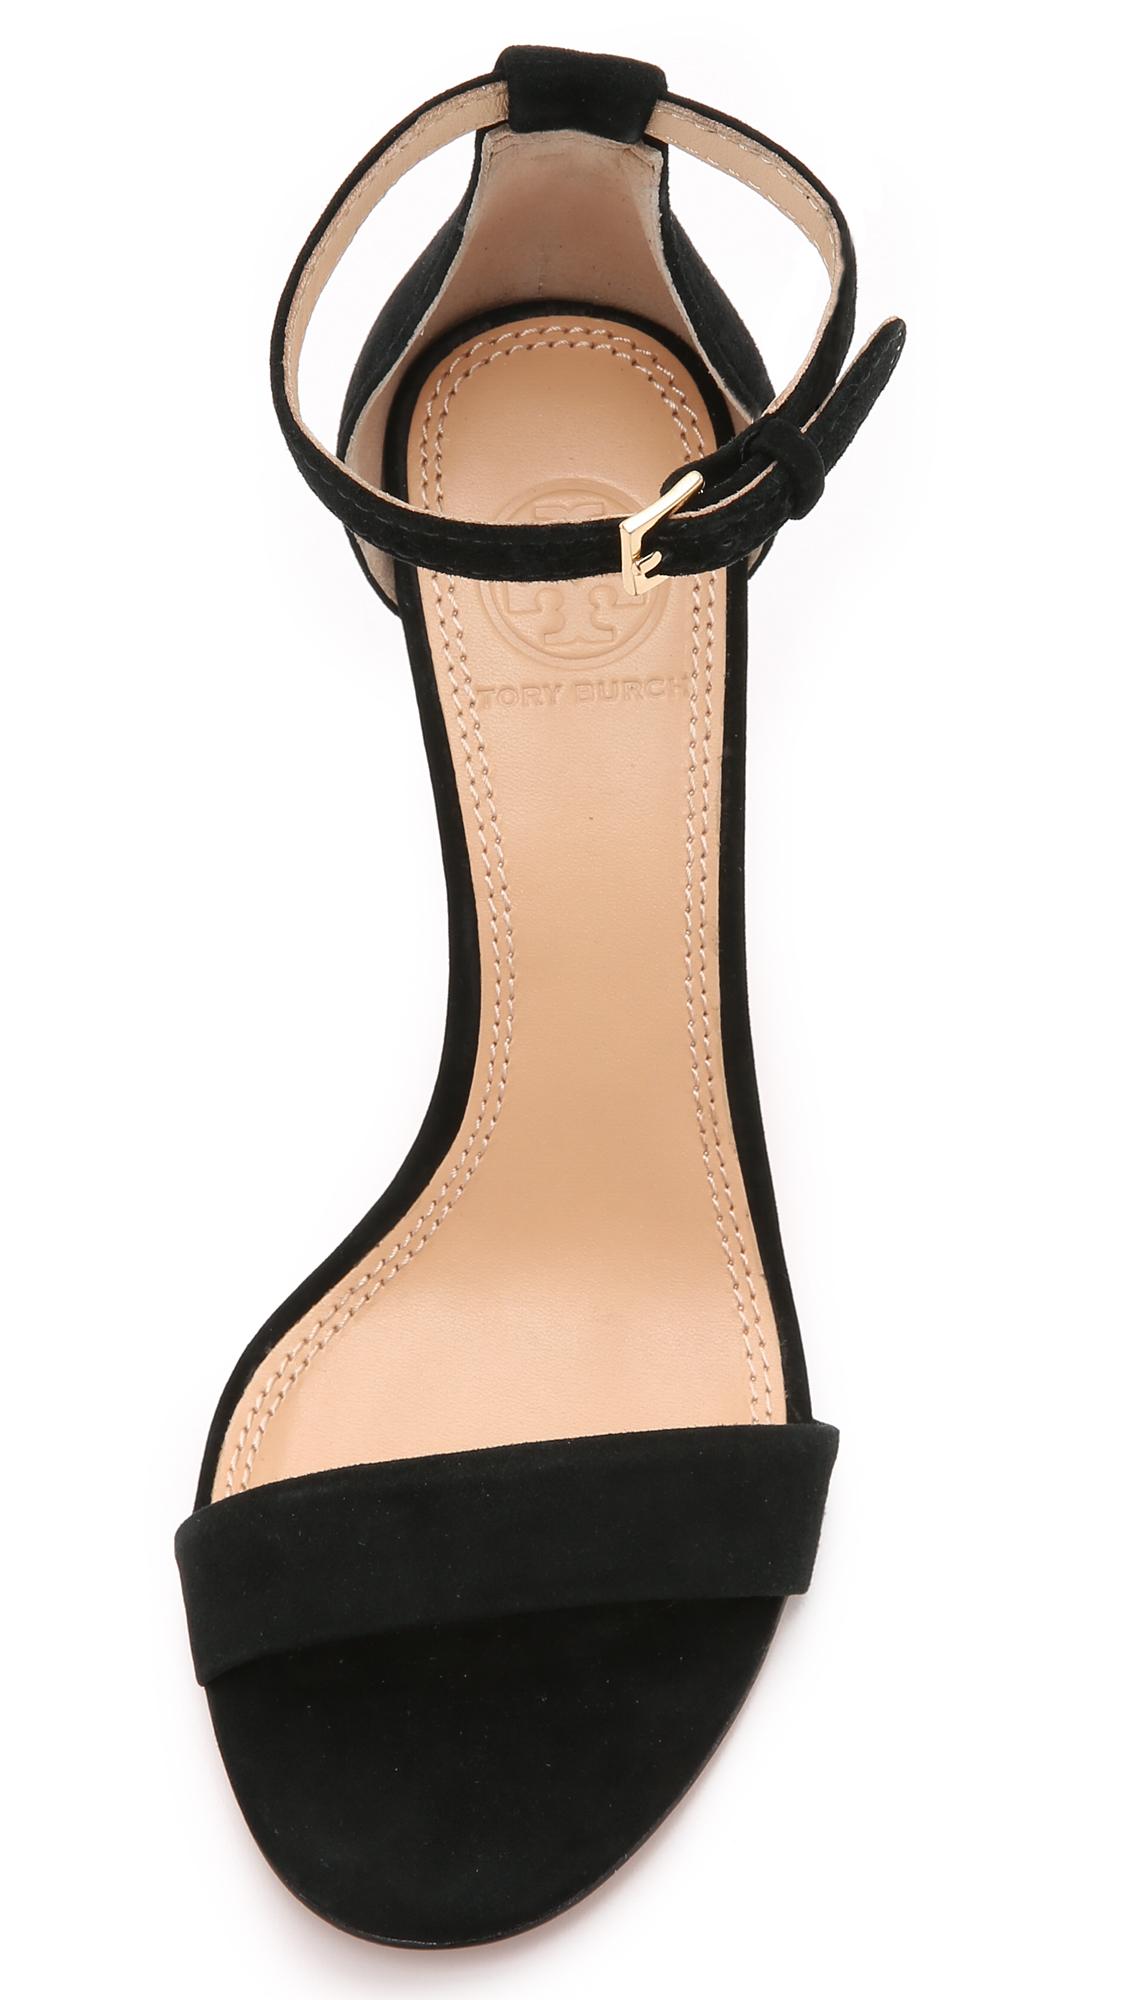 c3040ff7ed7f Lyst - Tory Burch Classic Ankle Strap Sandals in Black